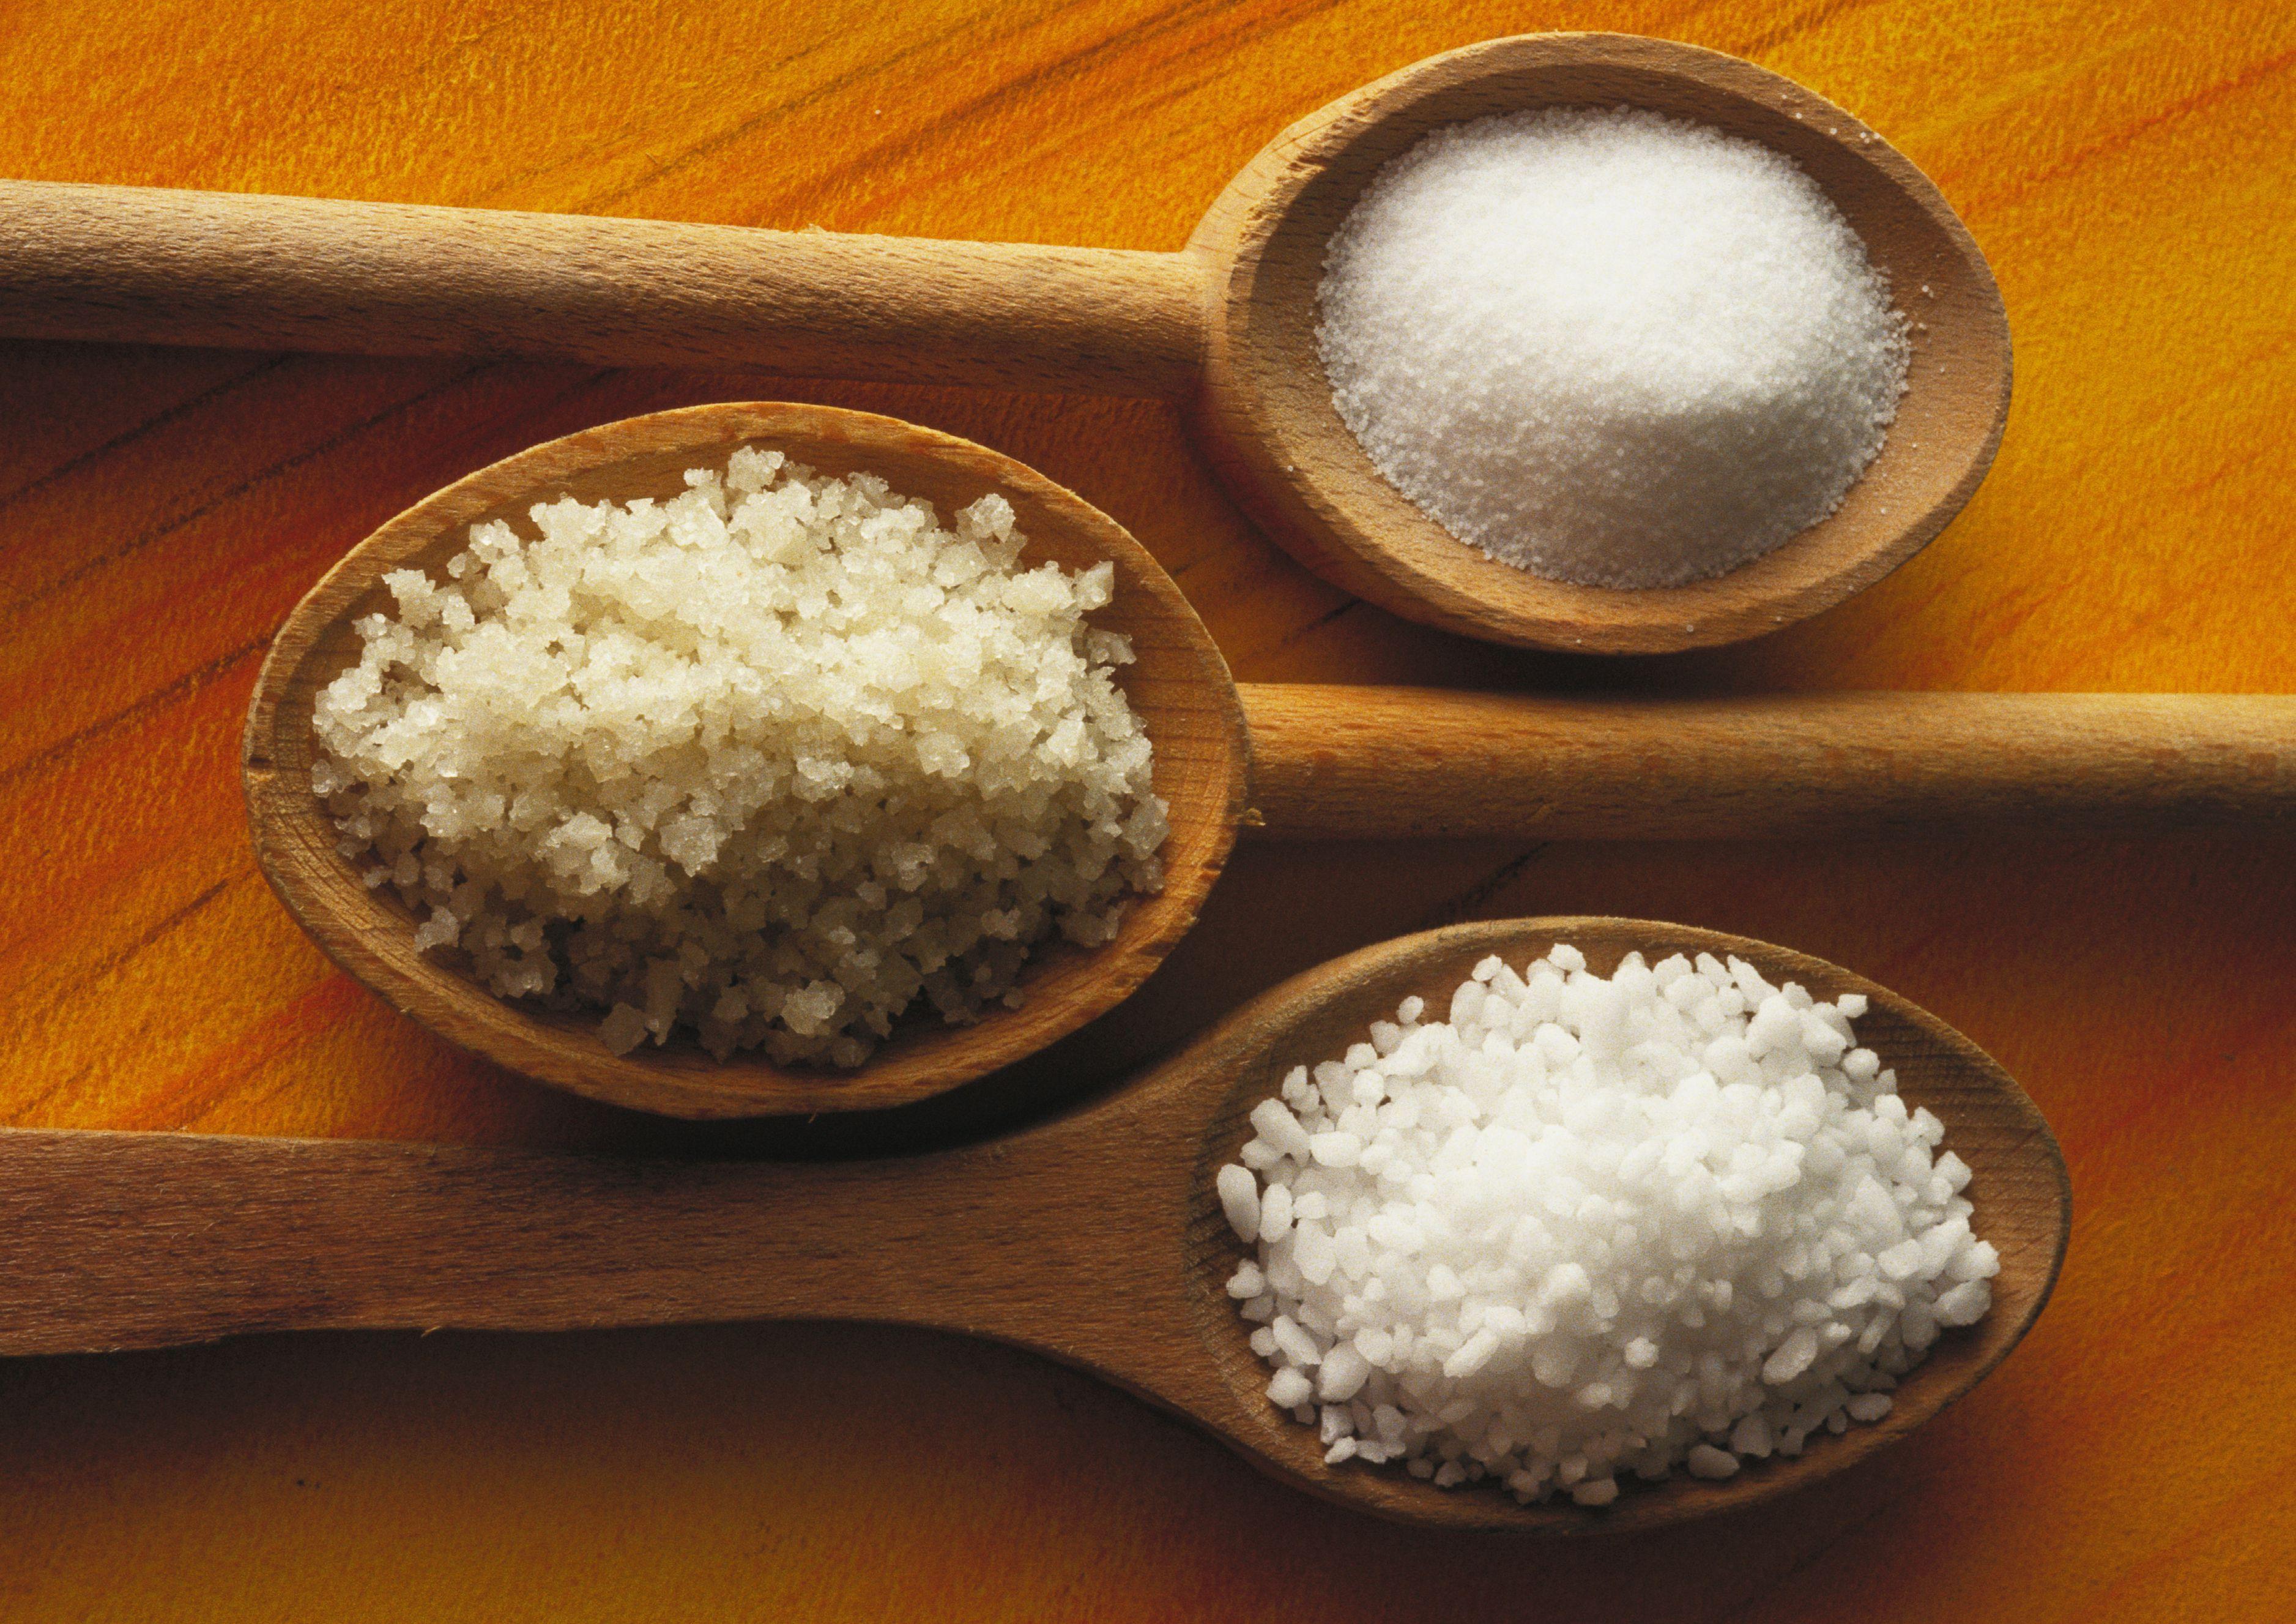 Three types of salt in wooden spoons